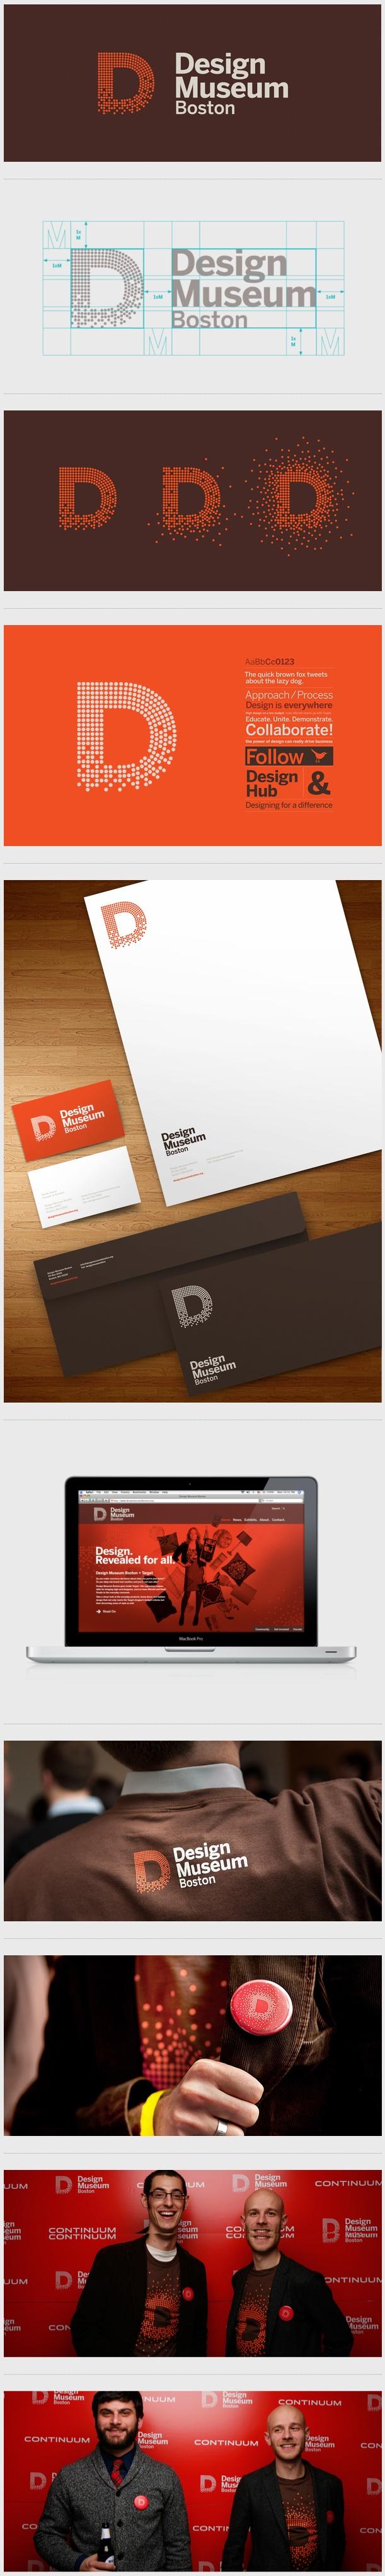 Design Museum Boston on Branding Served                                                                                                                                                                                 More